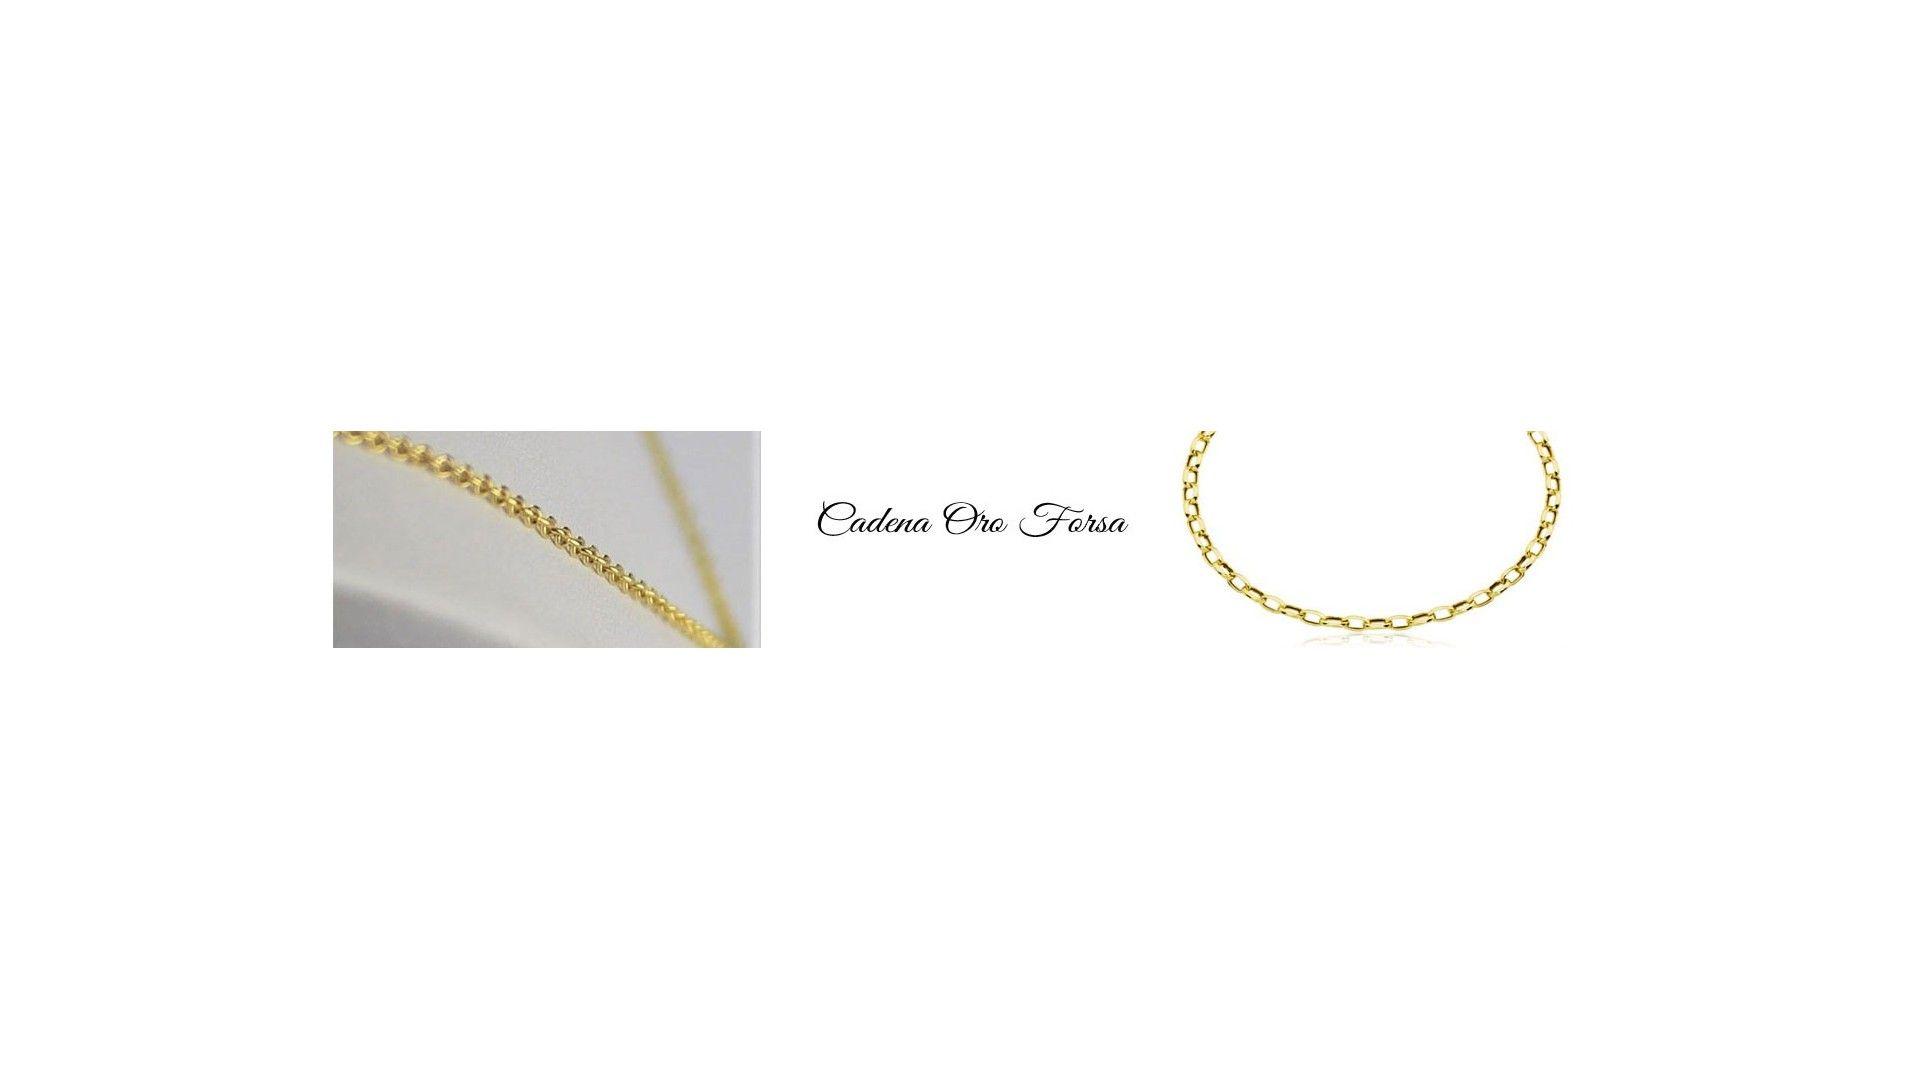 Comprar cadenas Forsa de Oro online